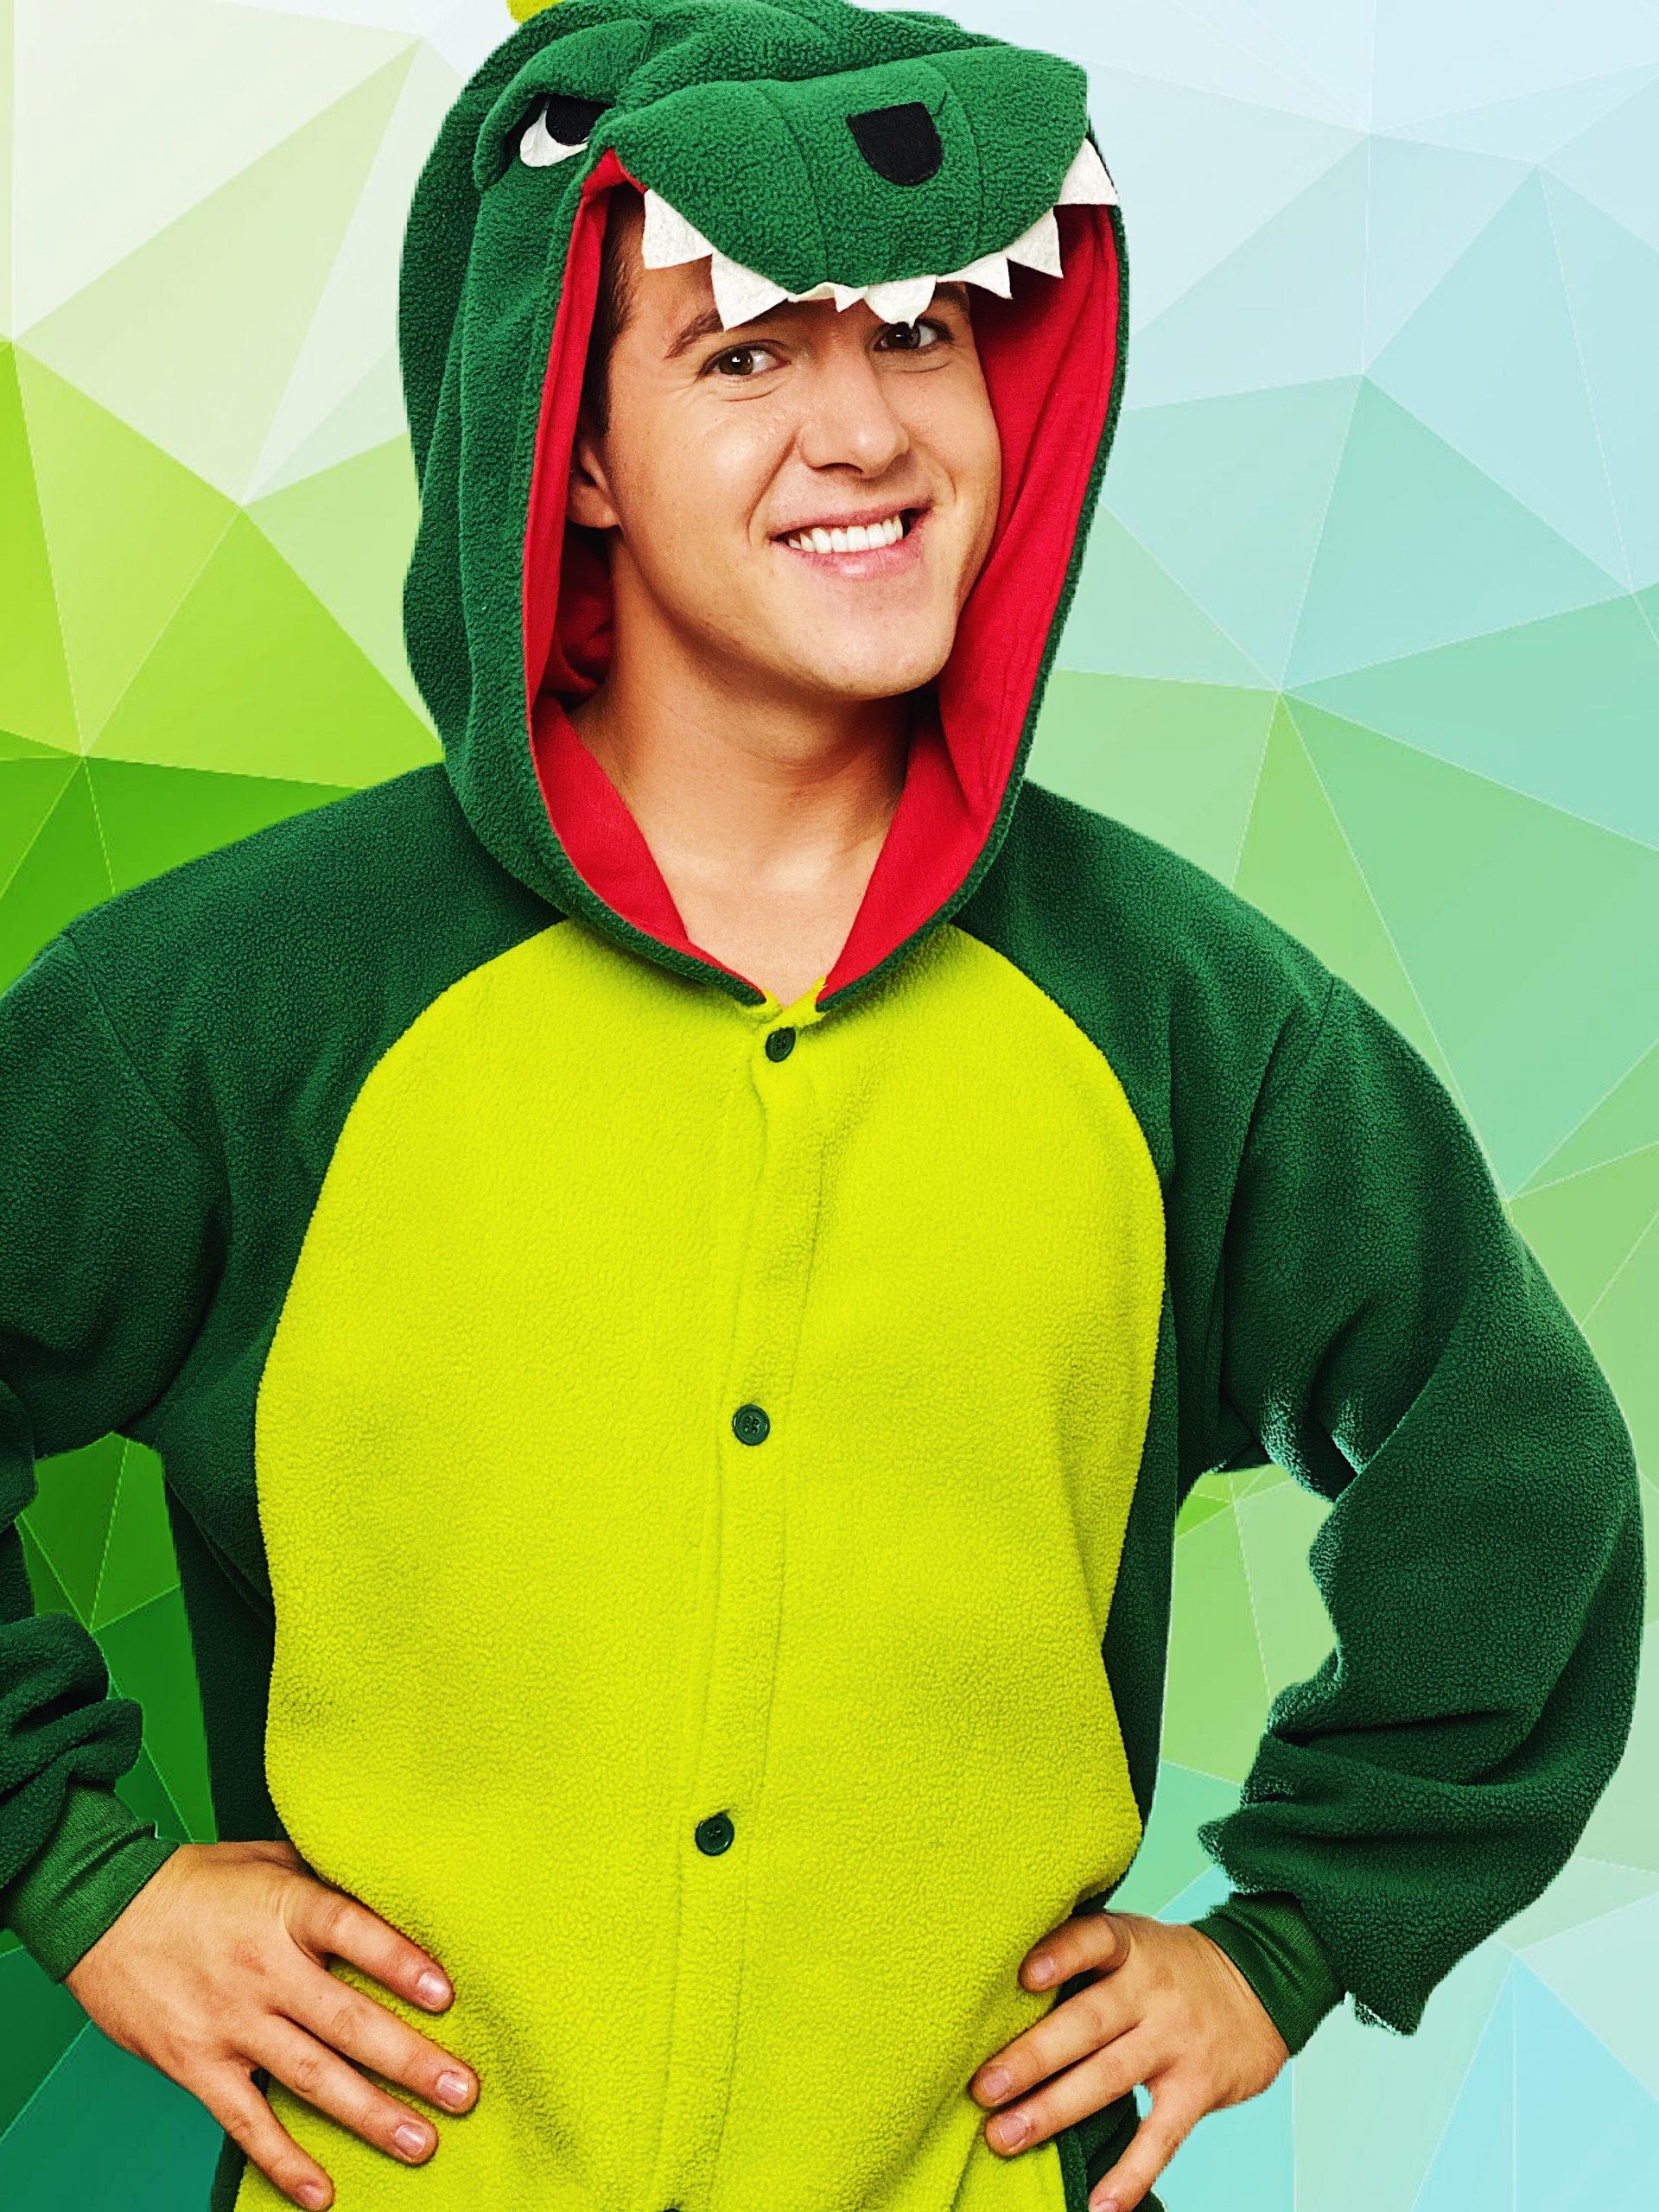 dinosaur entertainers in dinosaur costumes London